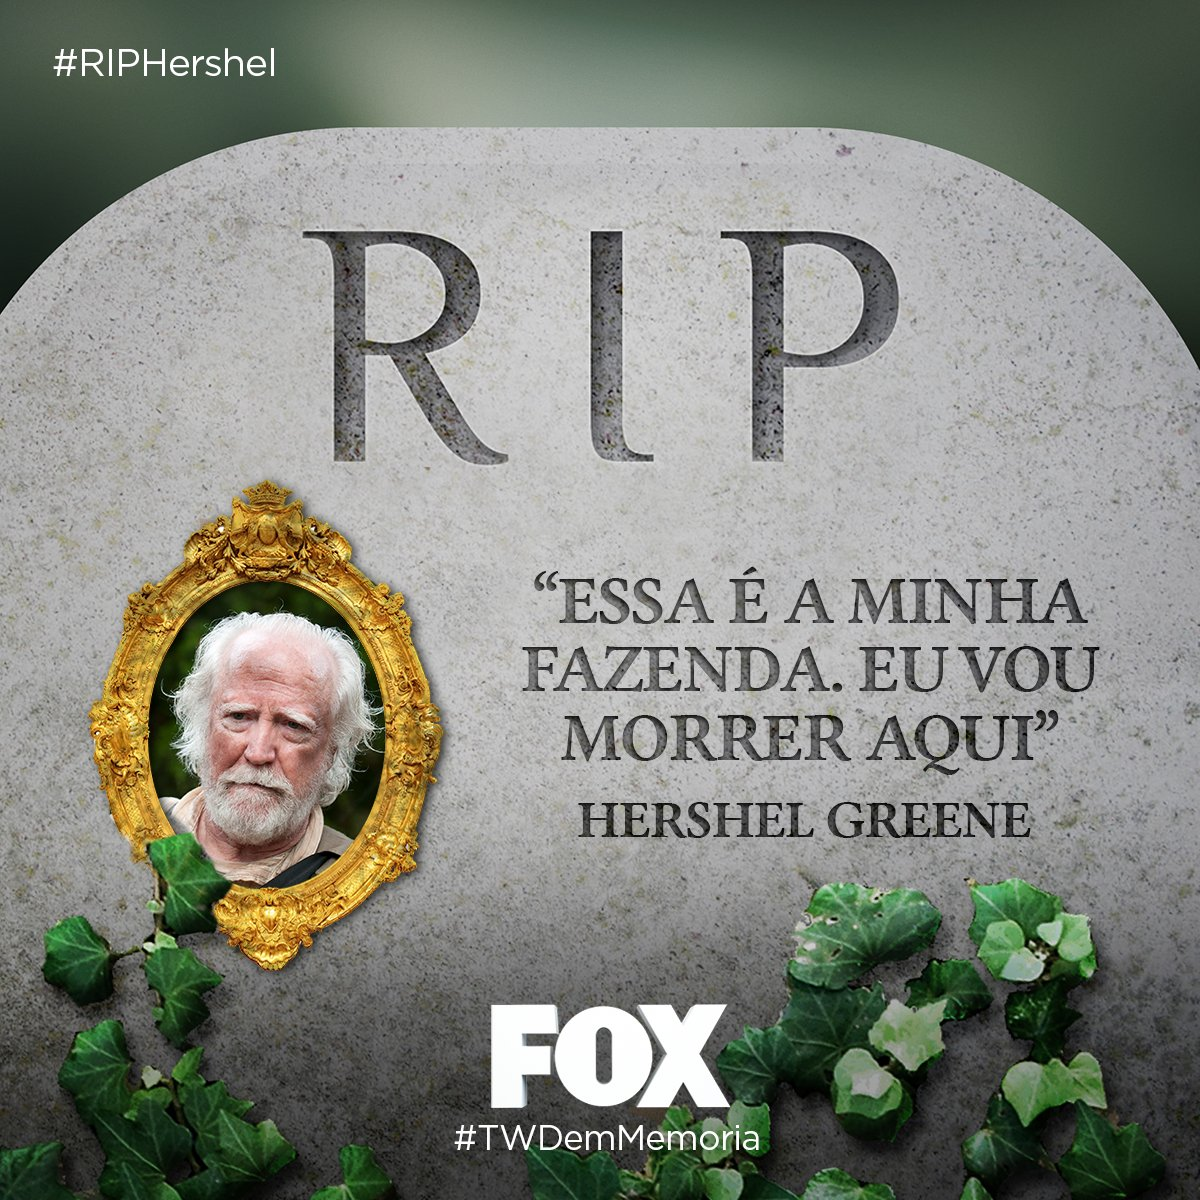 #RIPHershel: RIP Hershel